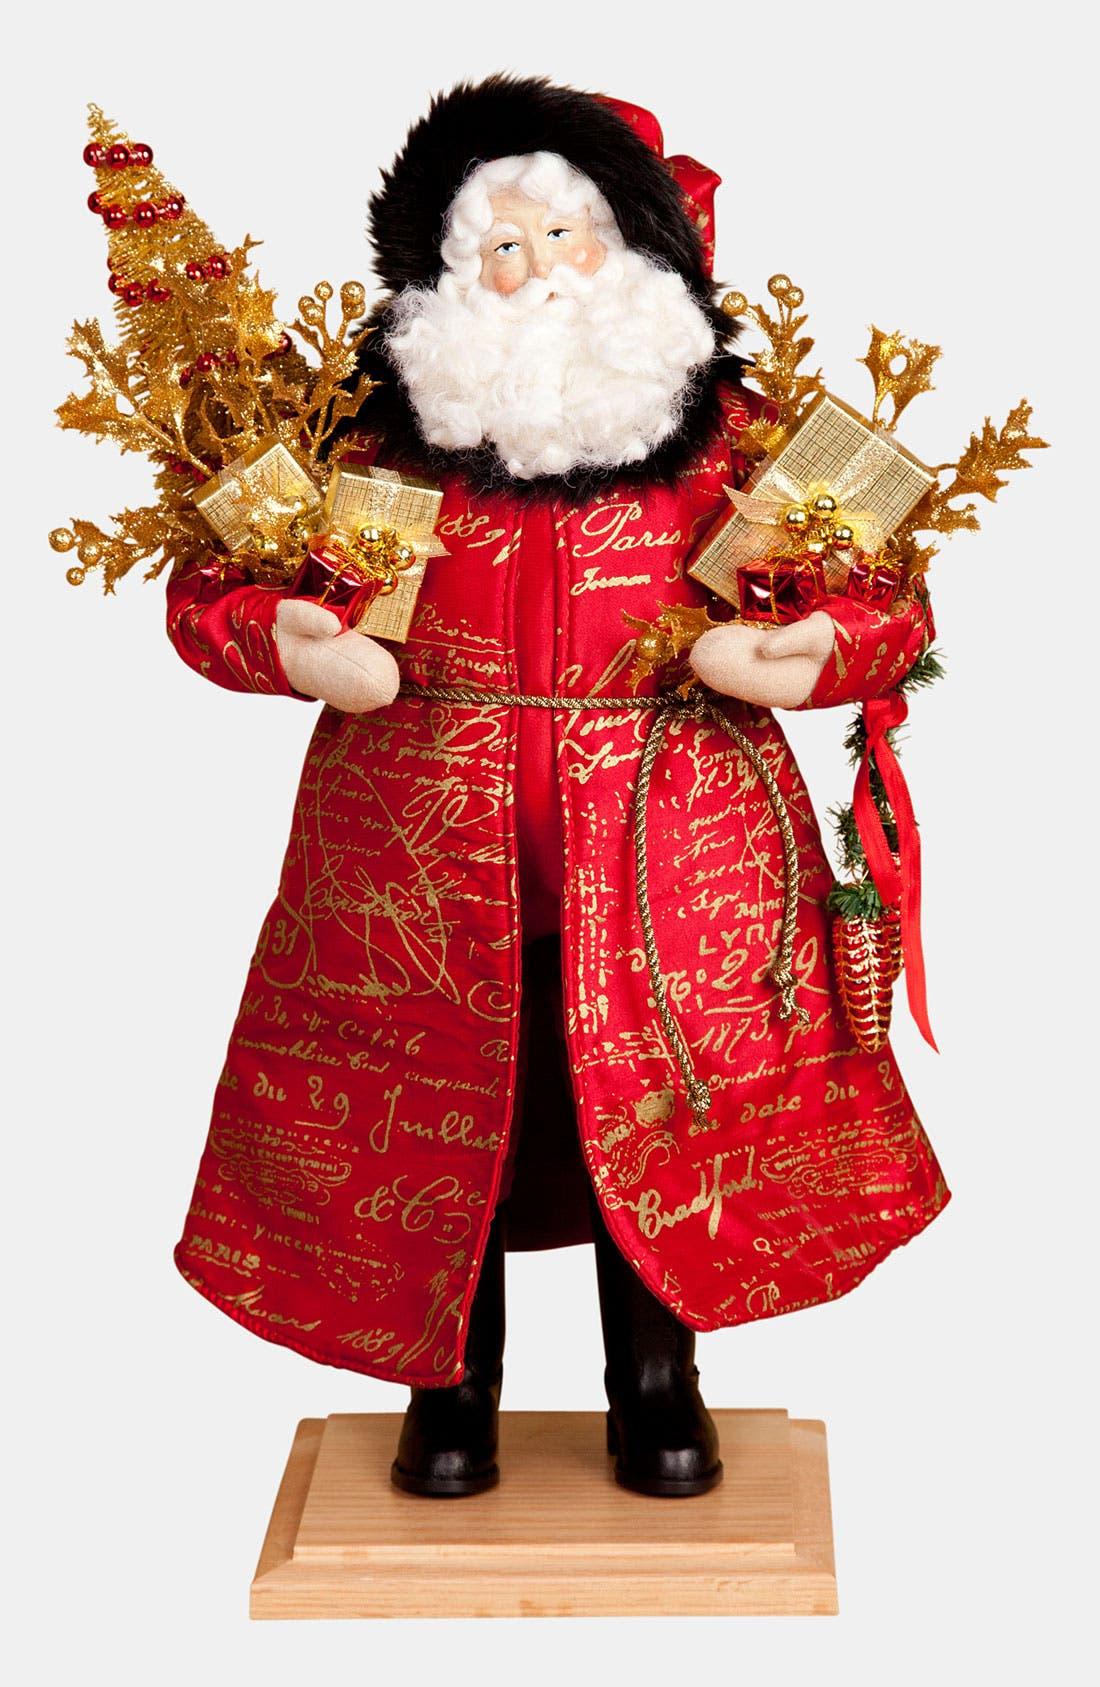 Alternate Image 1 Selected - Lynn Haney 'Memories of Christmas' Santa Figurine